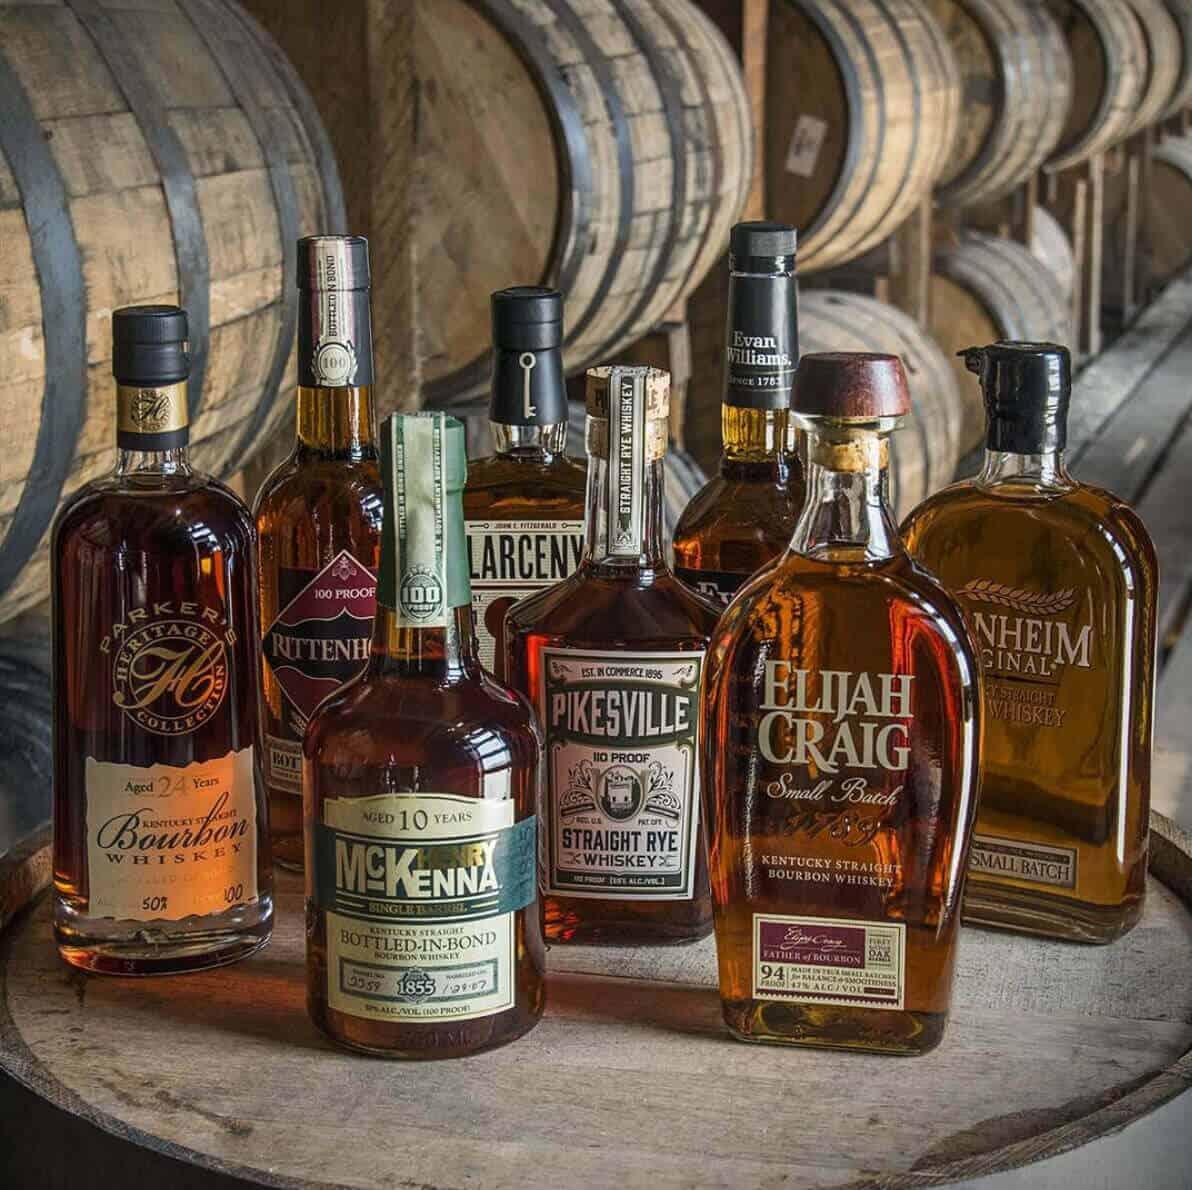 Heaven Hill bourbon bottles